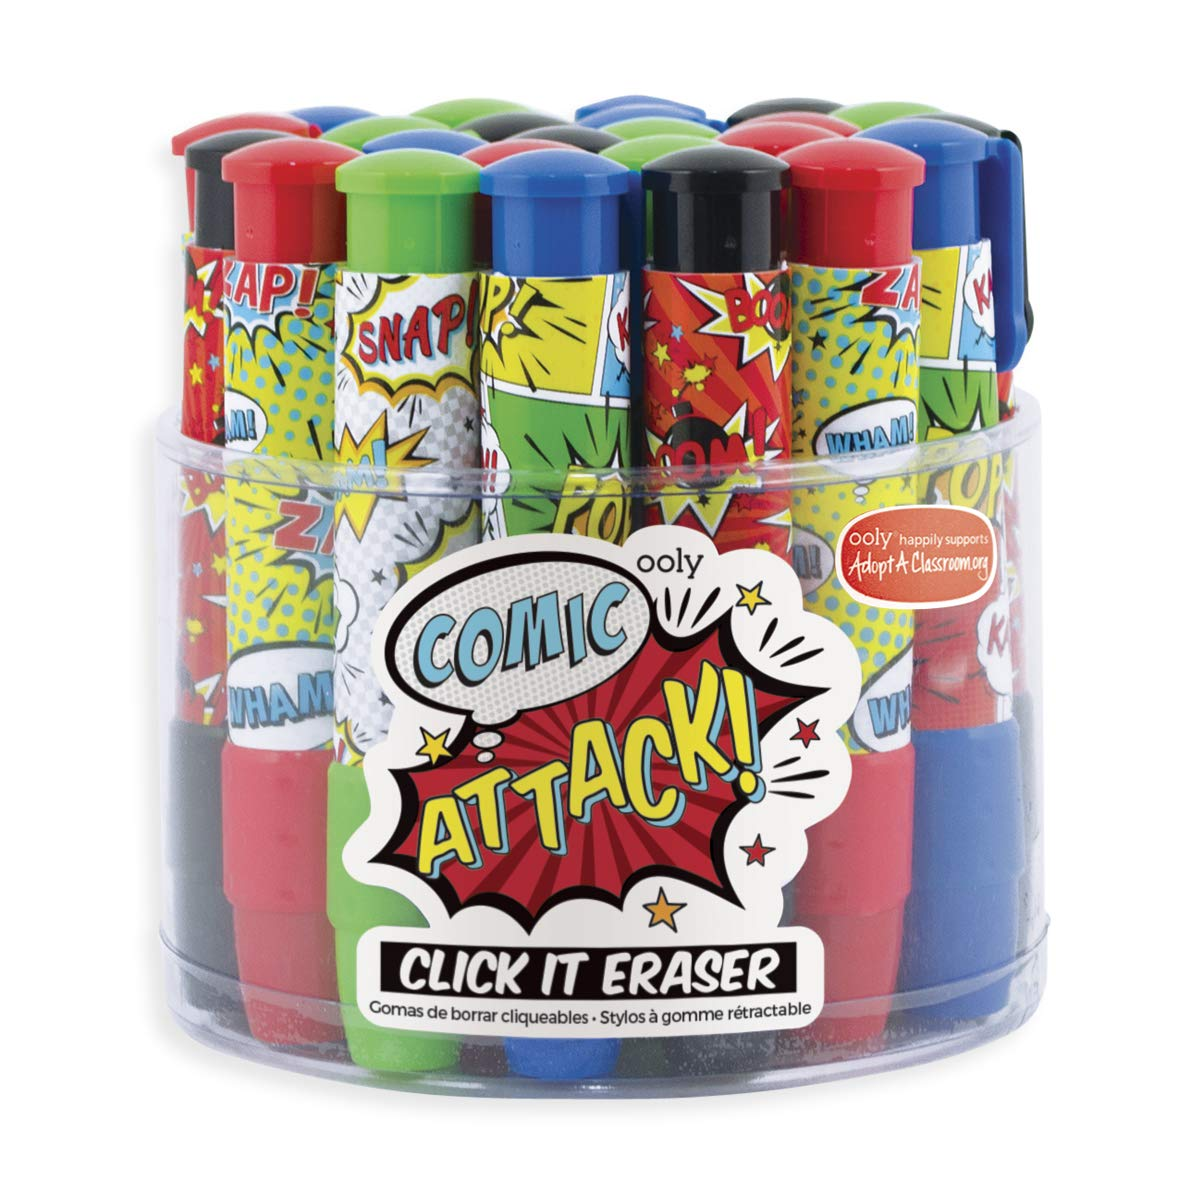 Click It Erasers - Tub of 24 - Comic Attack